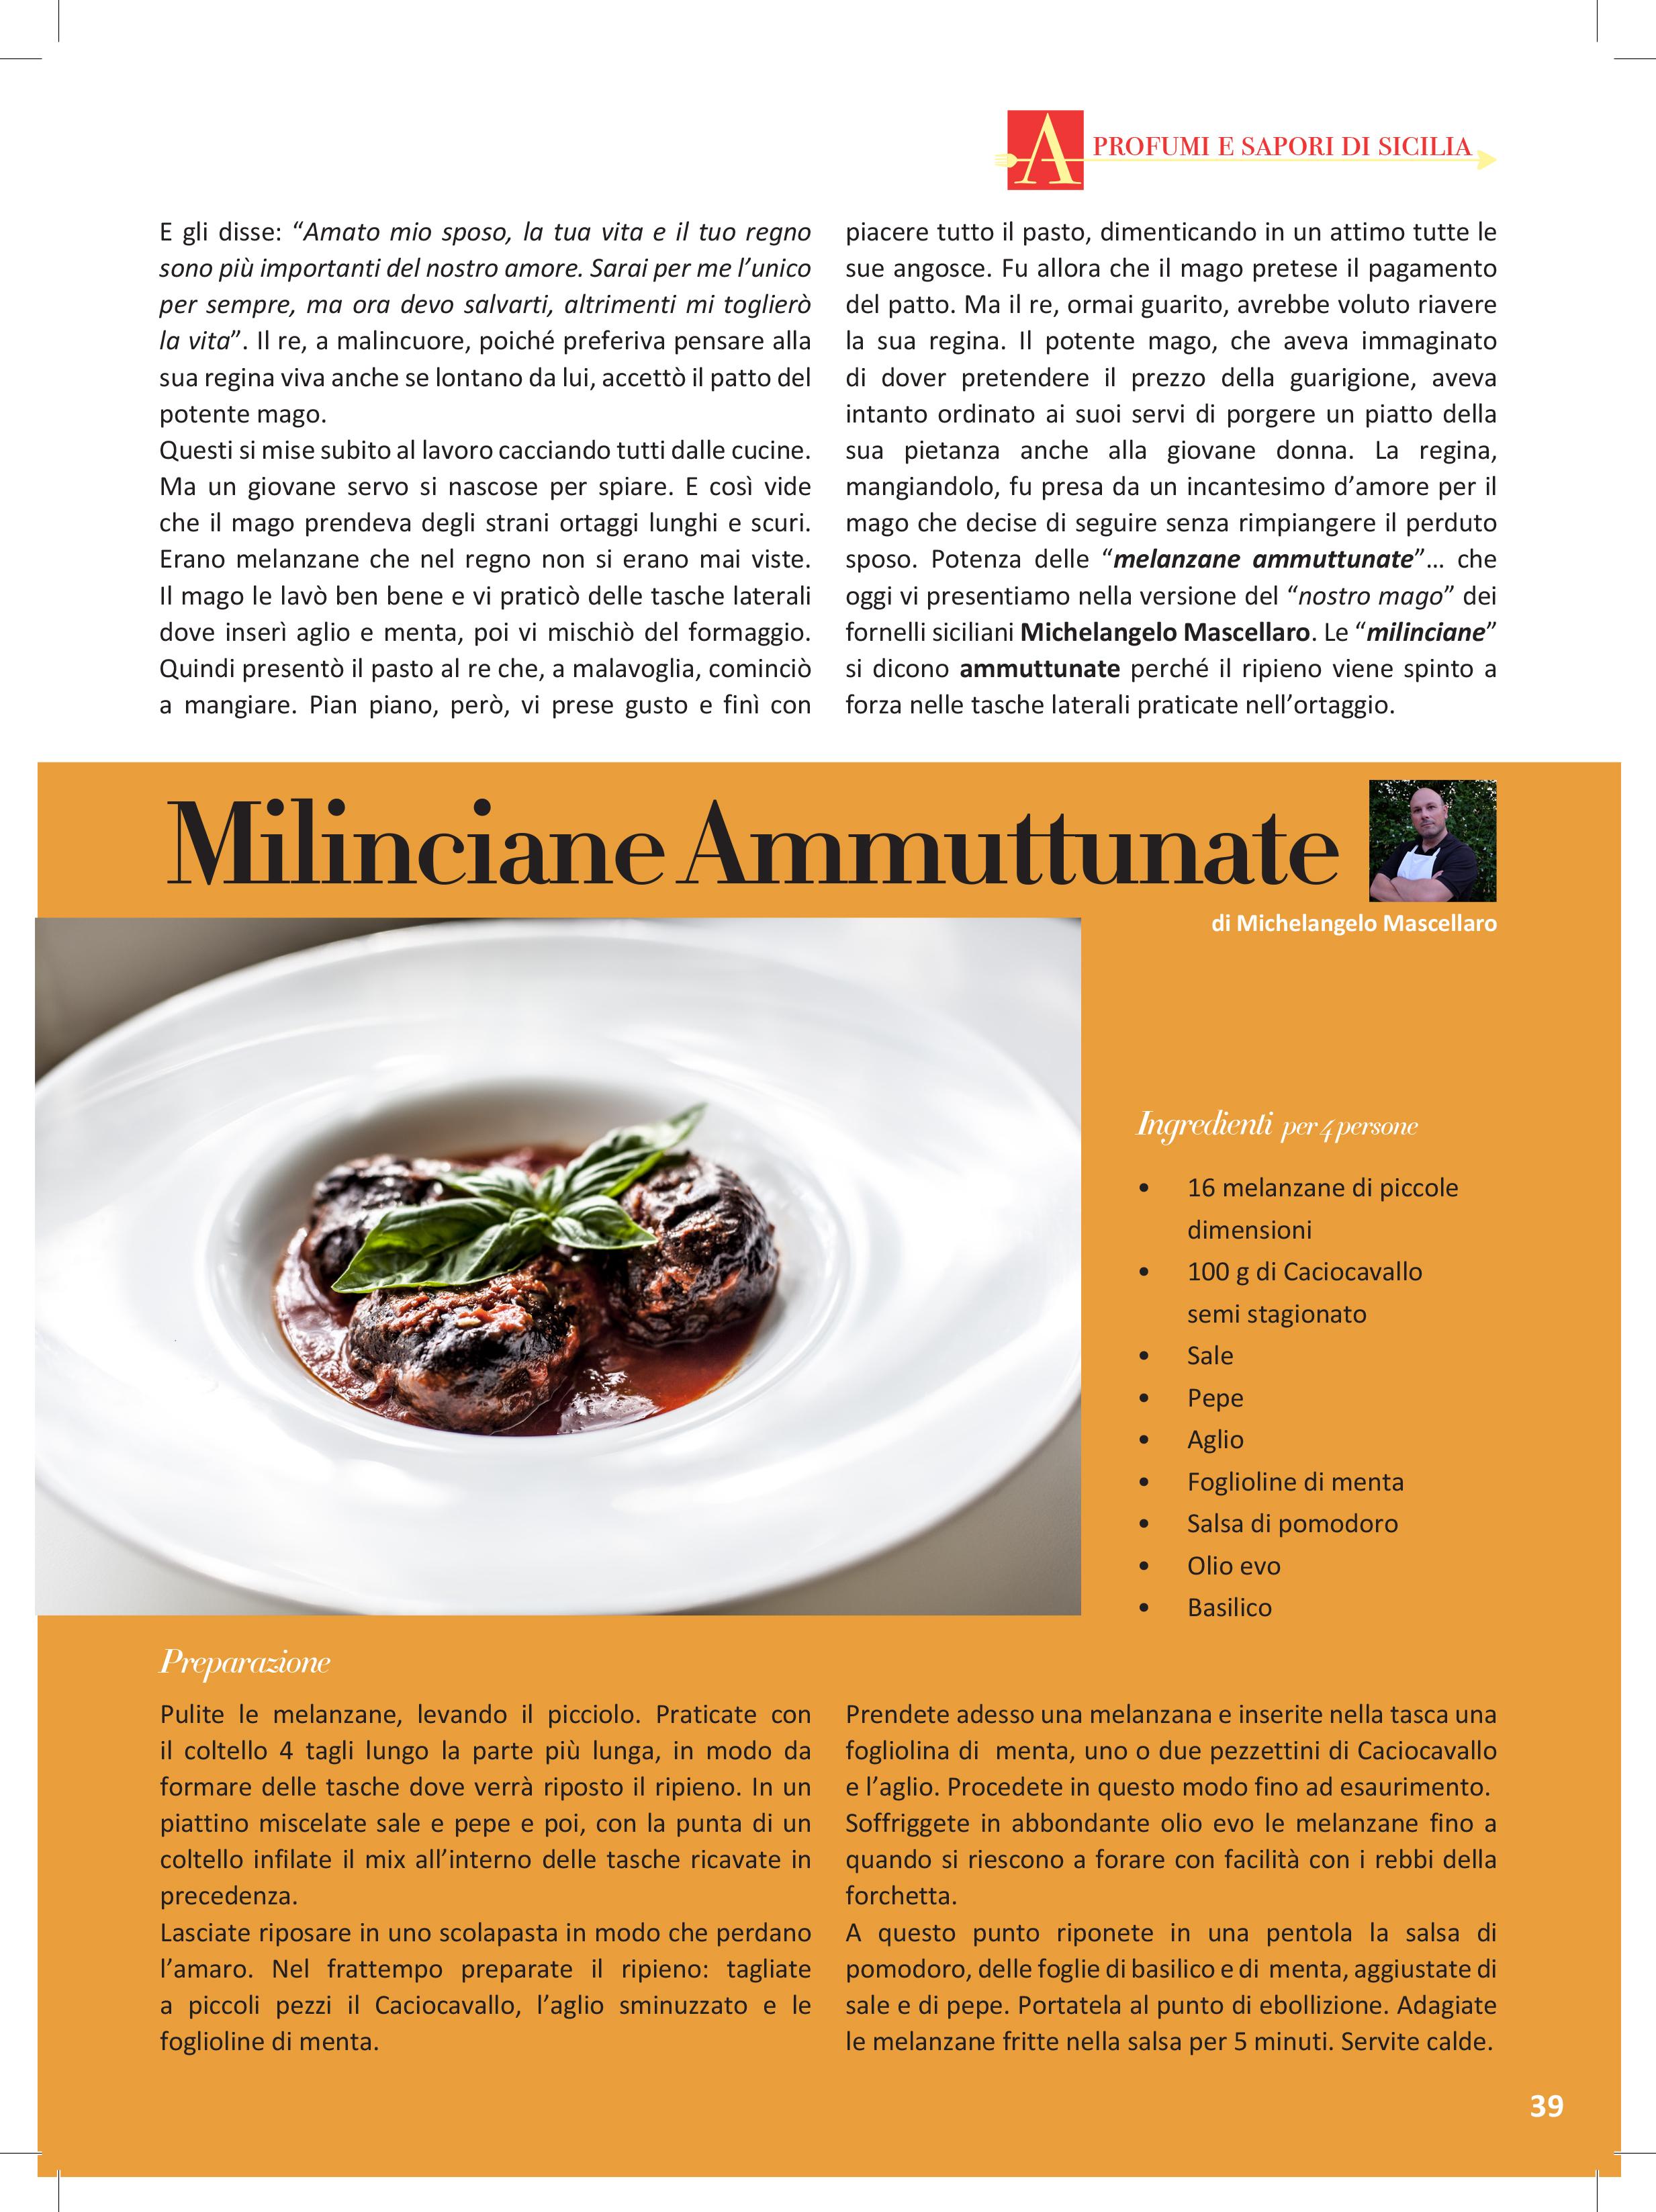 la ricetta delle milinciane ammuttunate su Cucina a Sud n.73